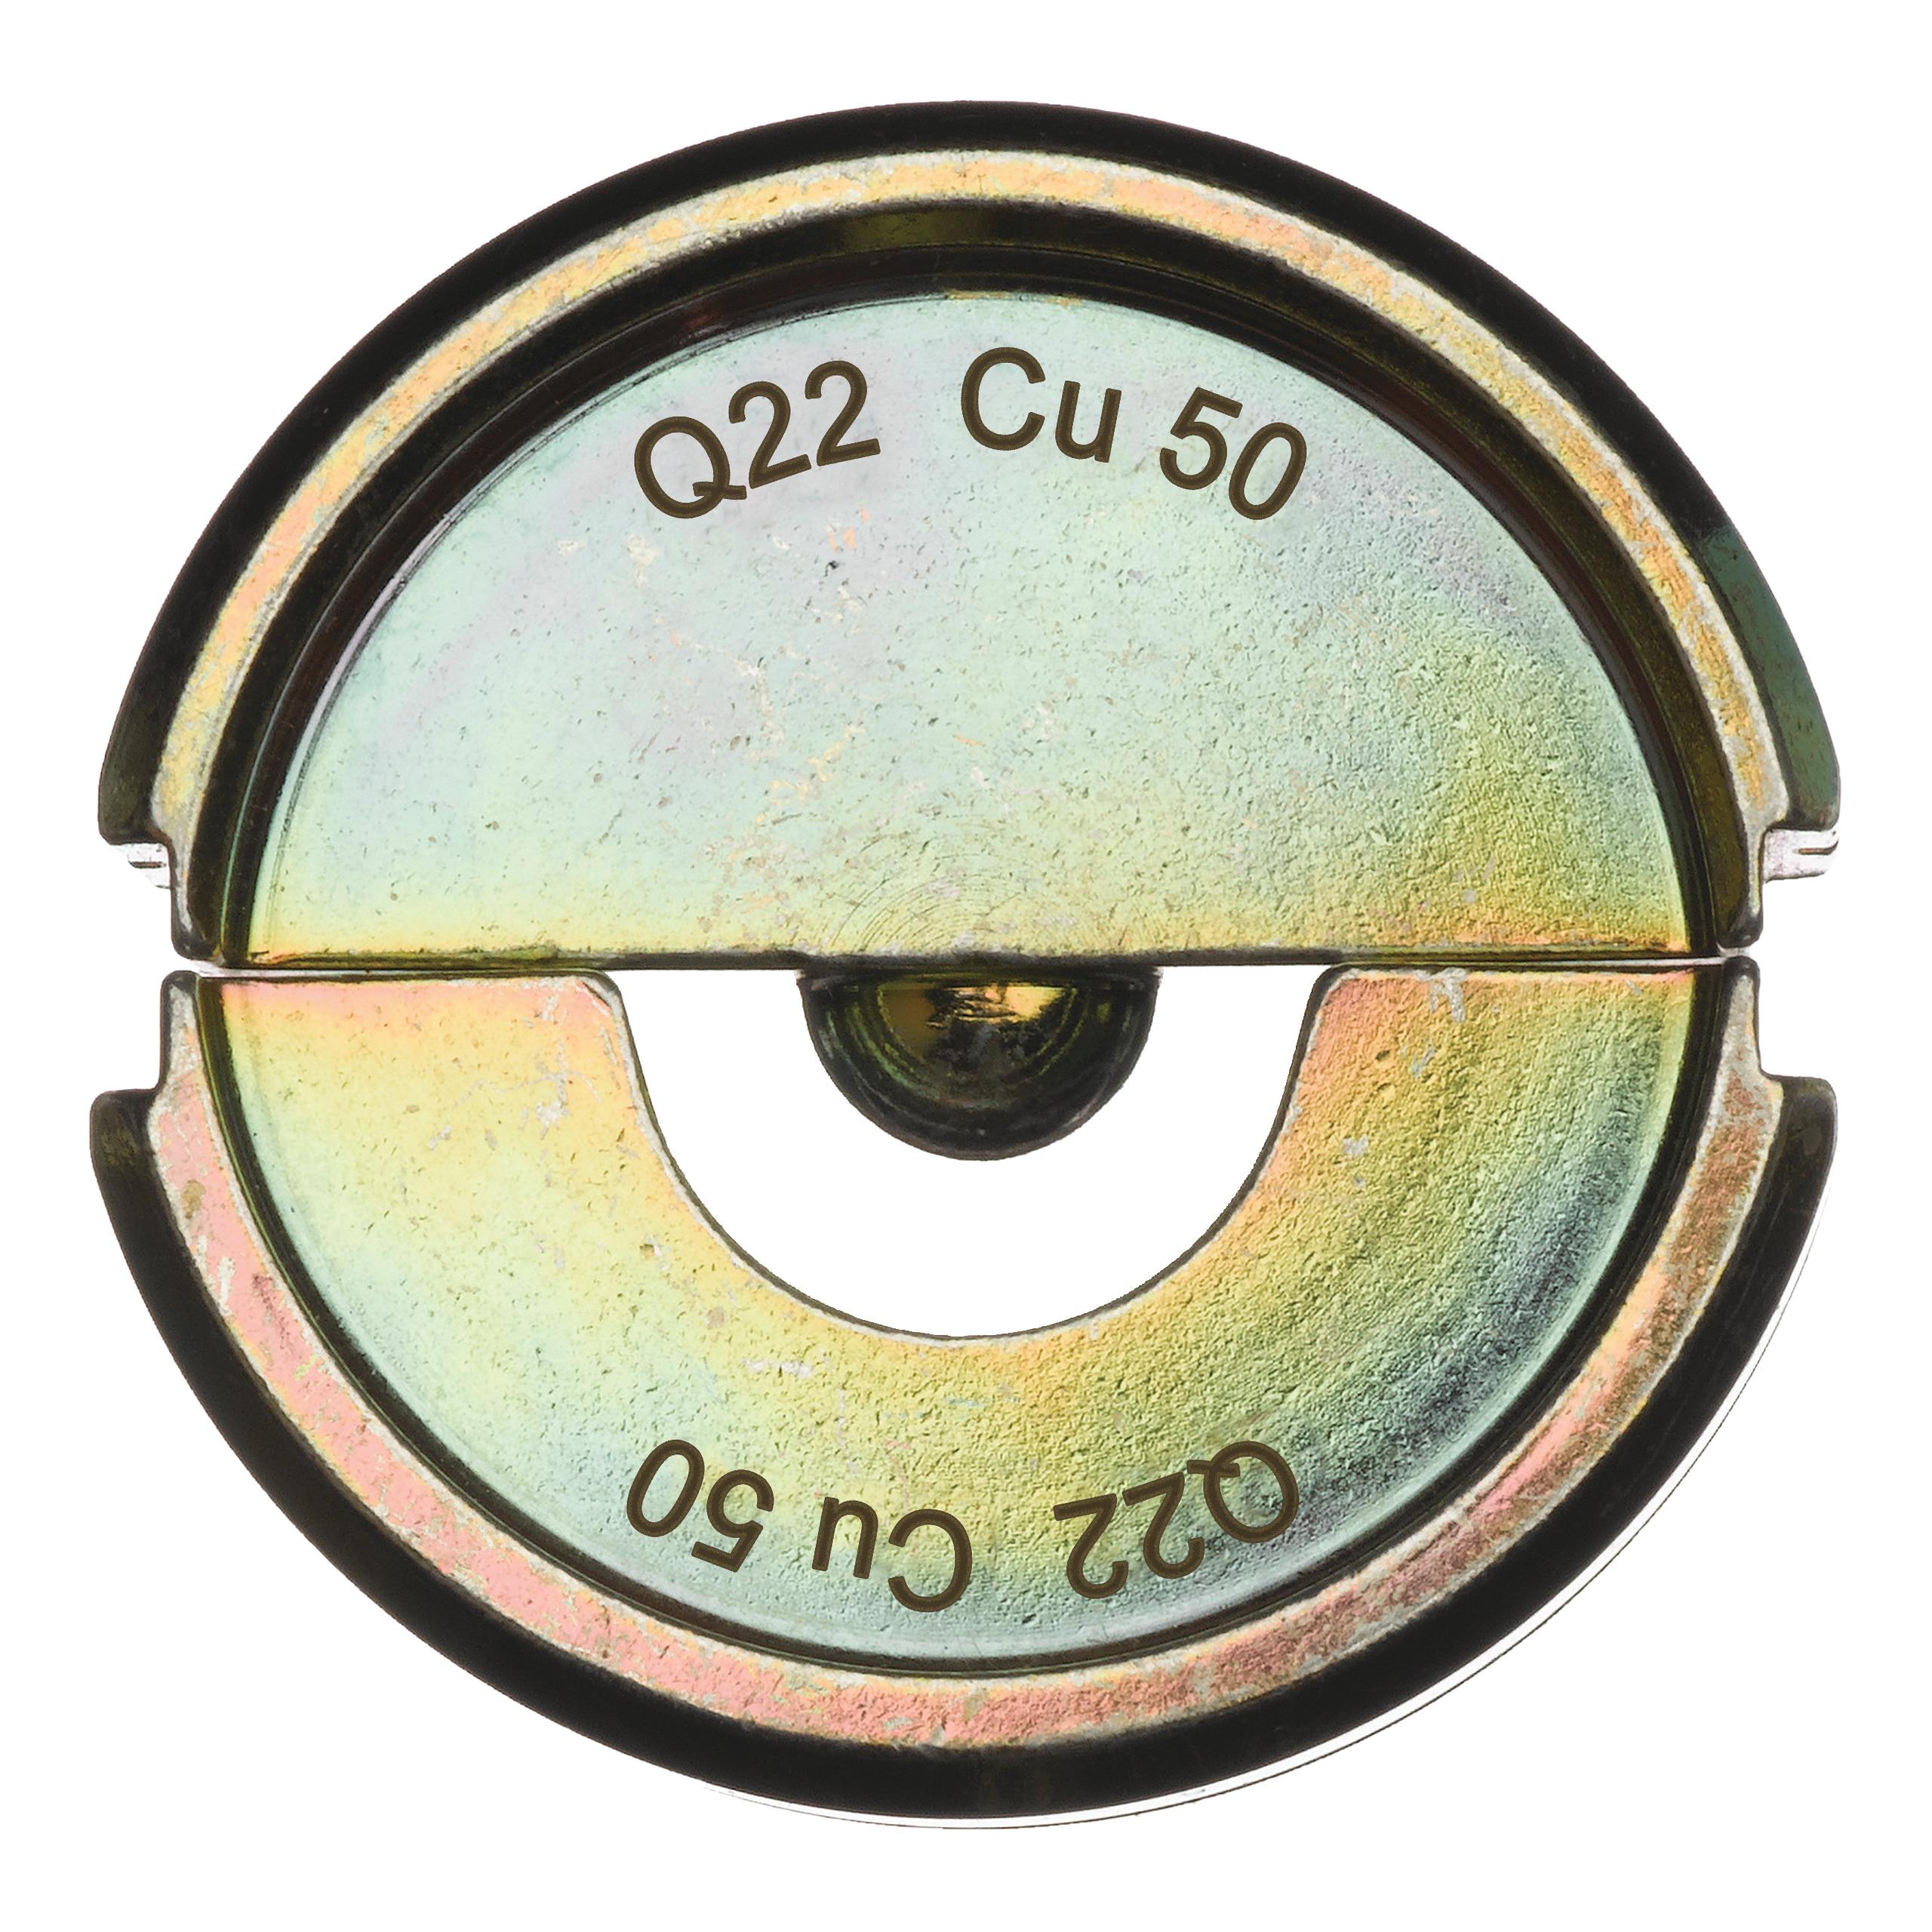 Krimpovací čelisti  Q22 CU 50